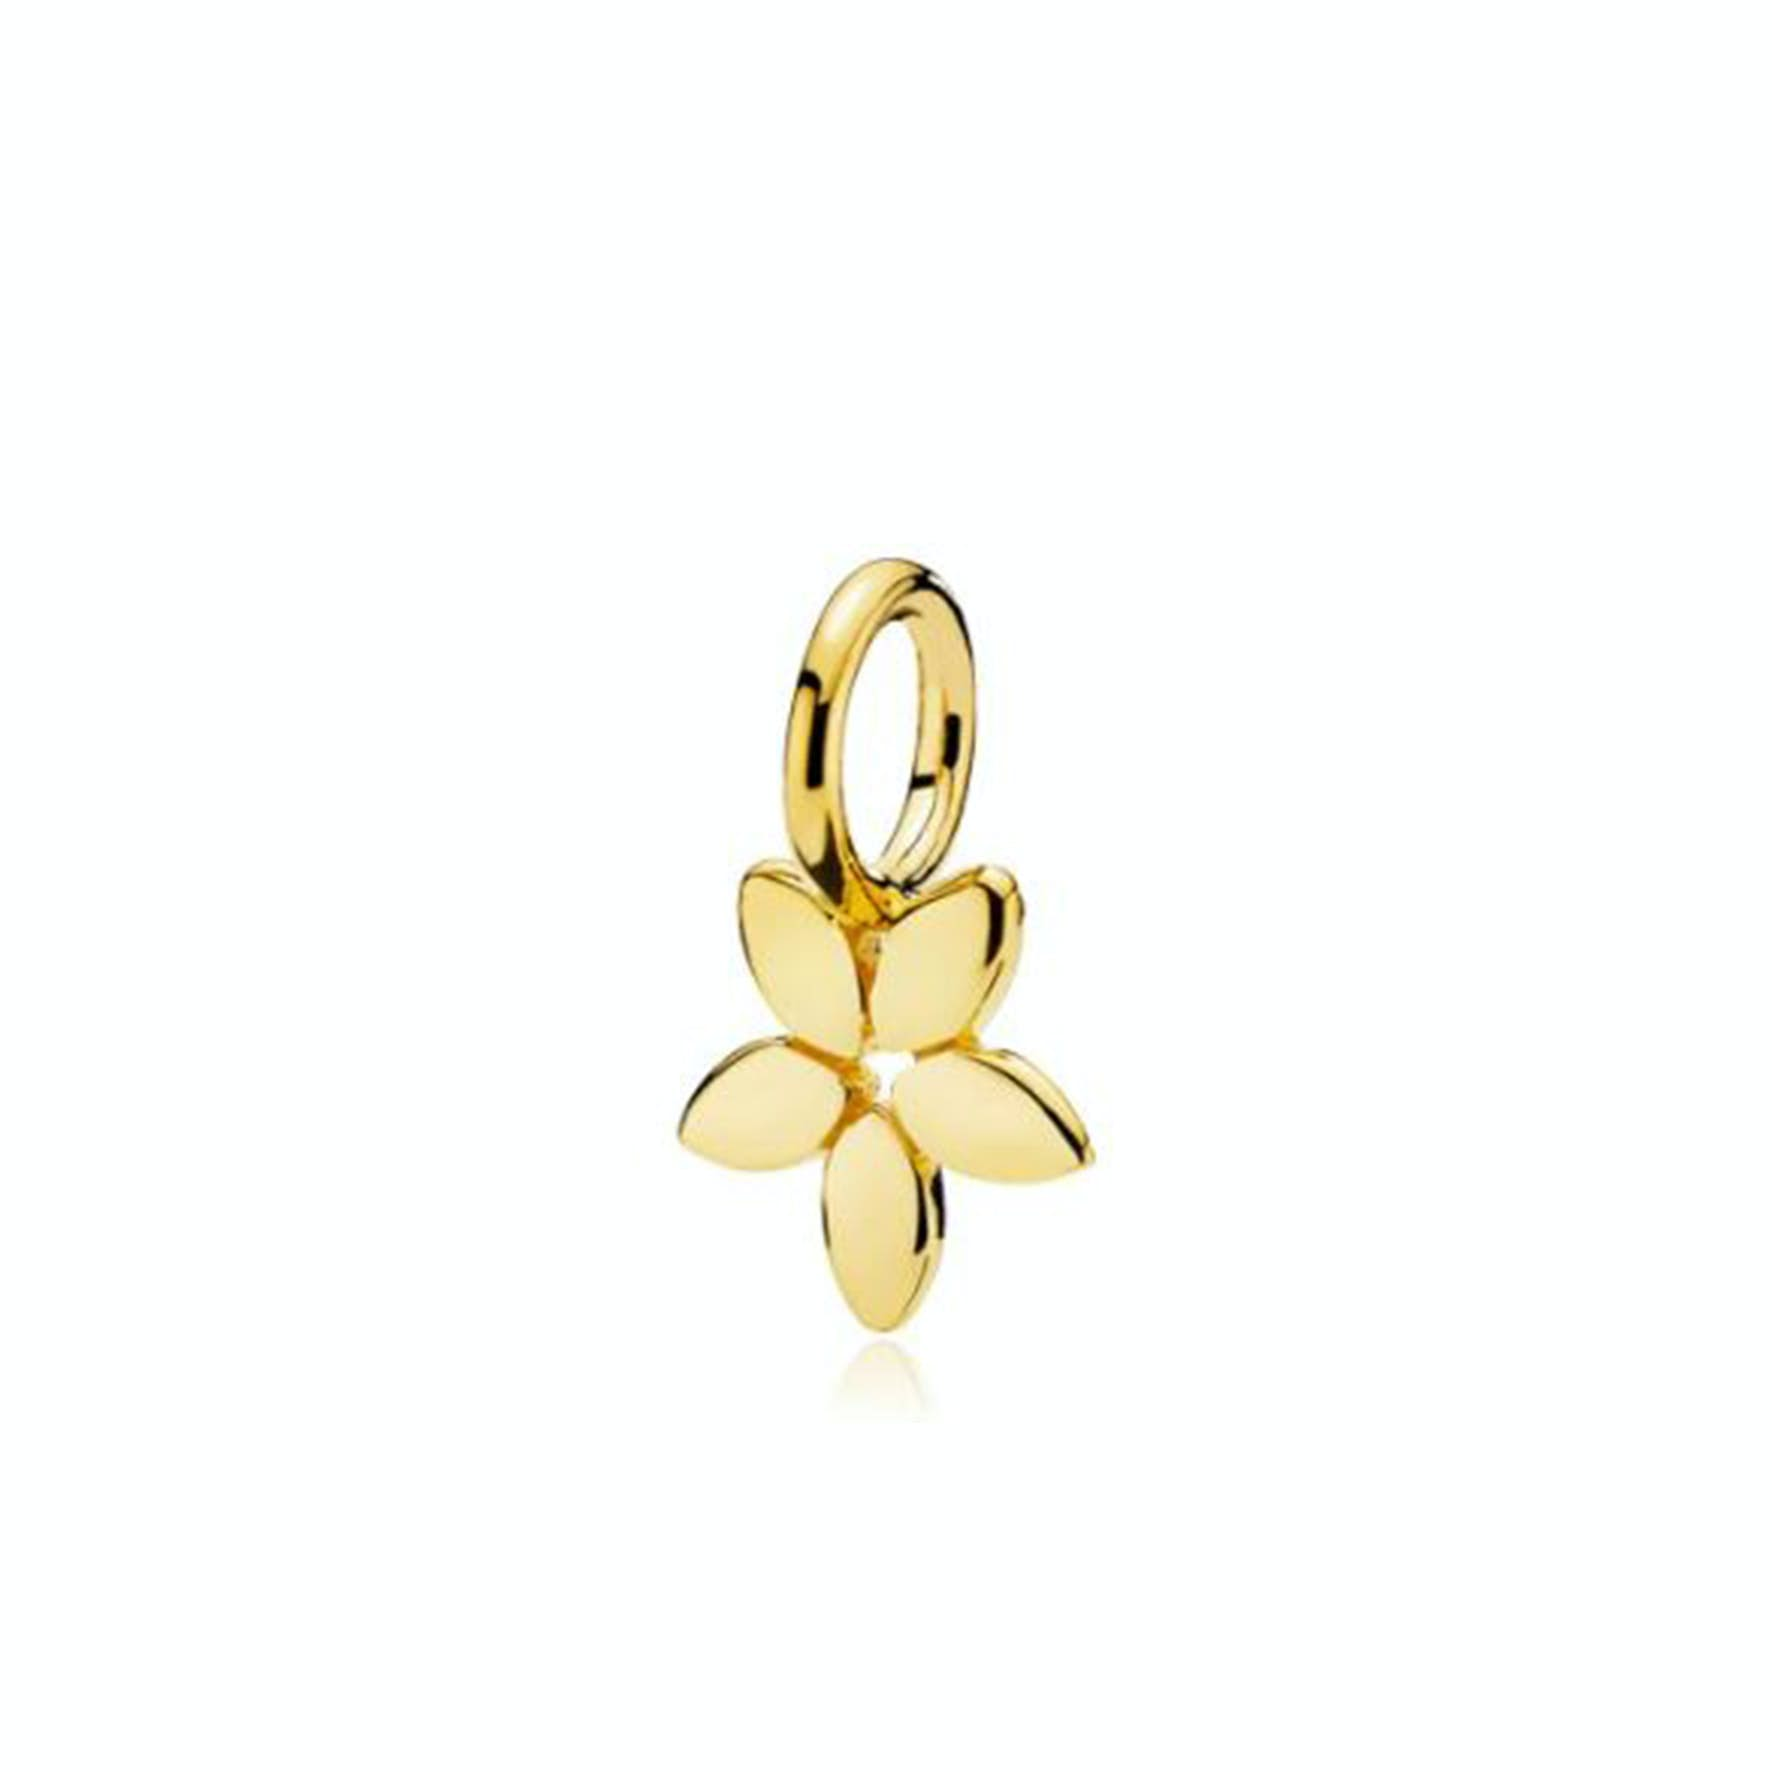 Magnolia pendant fra Izabel Camille i Forgylt-Sølv Sterling 925